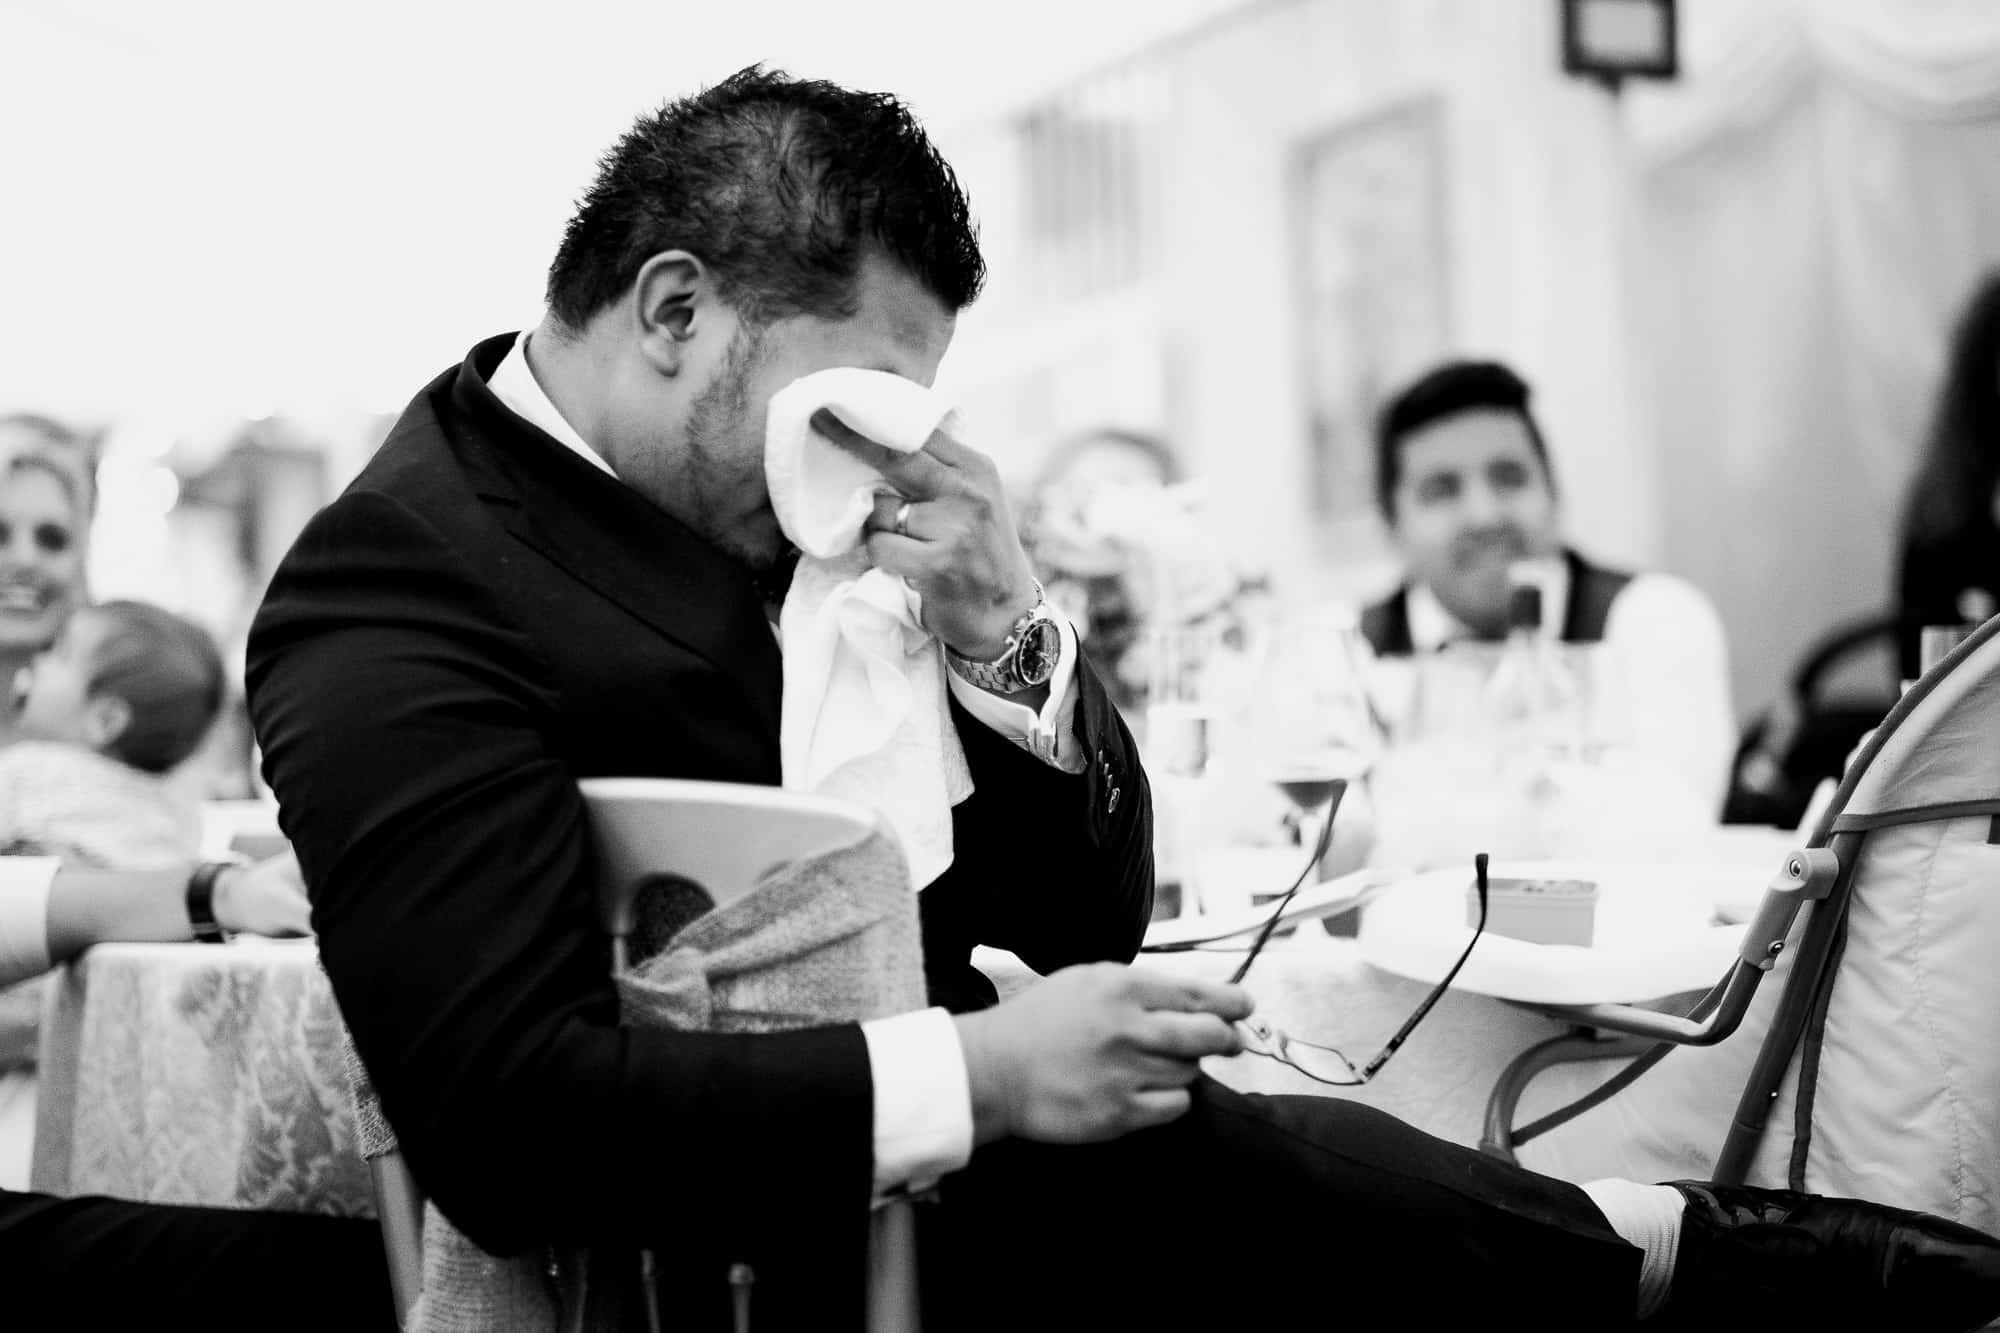 marleybrook-house-wedding-photography-matt-tyler-0058